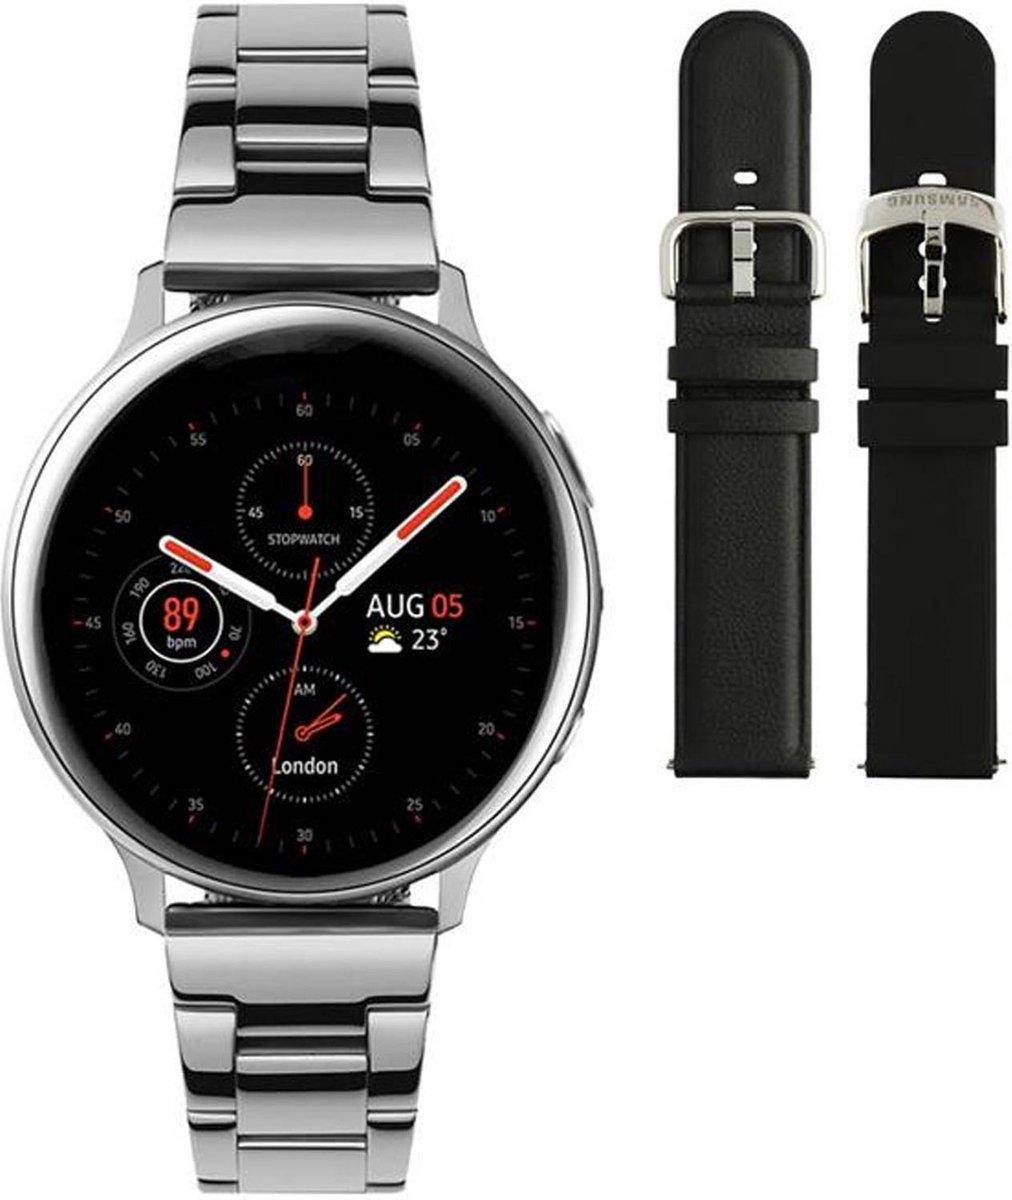 Samsung Active2 smartwatch SA.R830SS - Staal - Schakelband - Zilverkleurig - Ø 40 mm - Special edition kopen